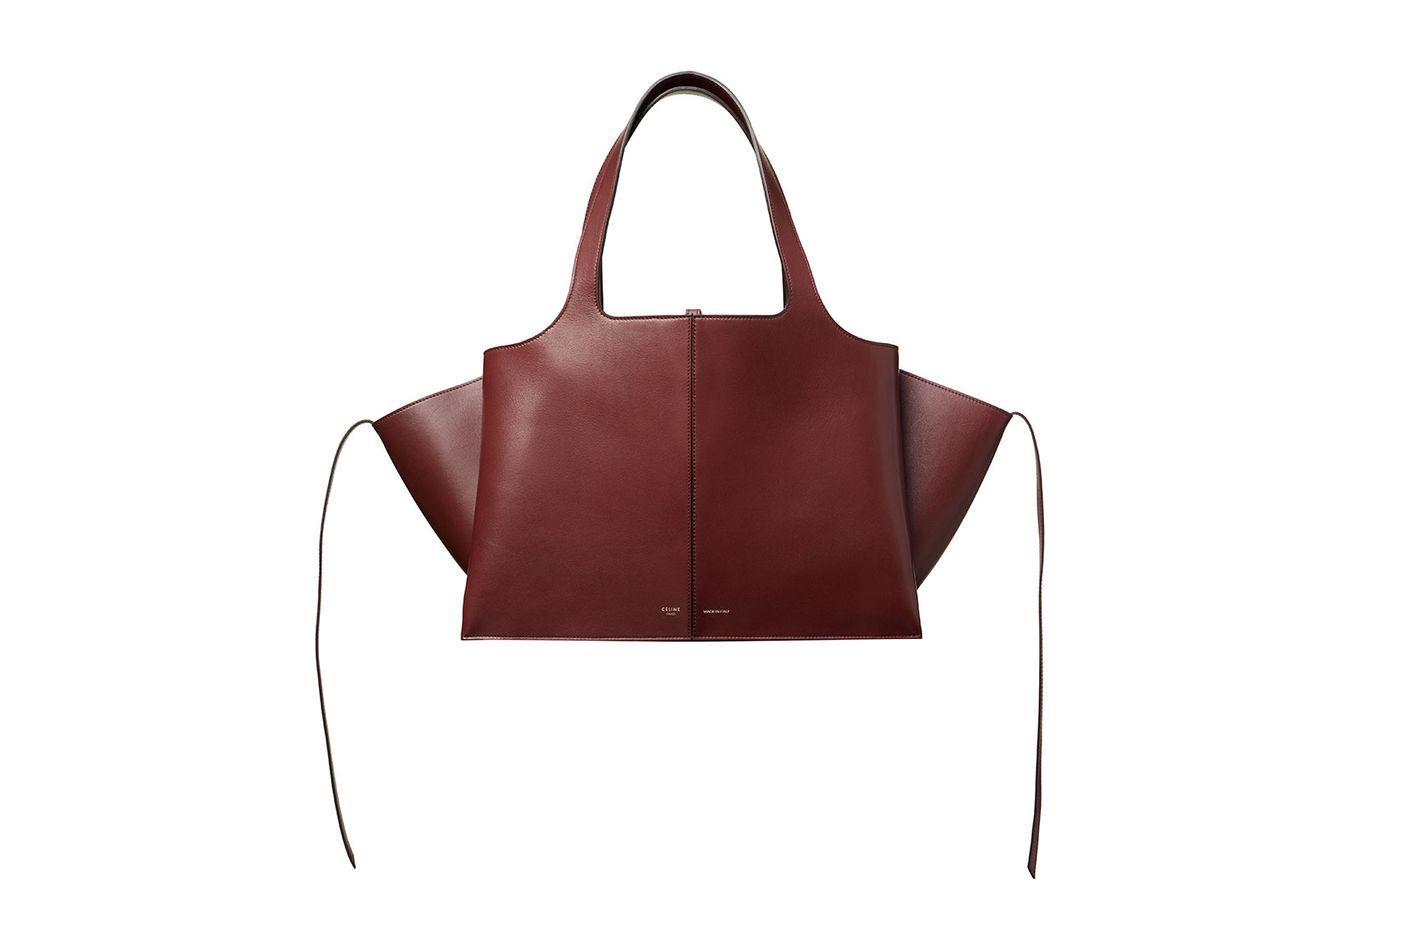 4767df4a83 Celine Introduces a New Bag